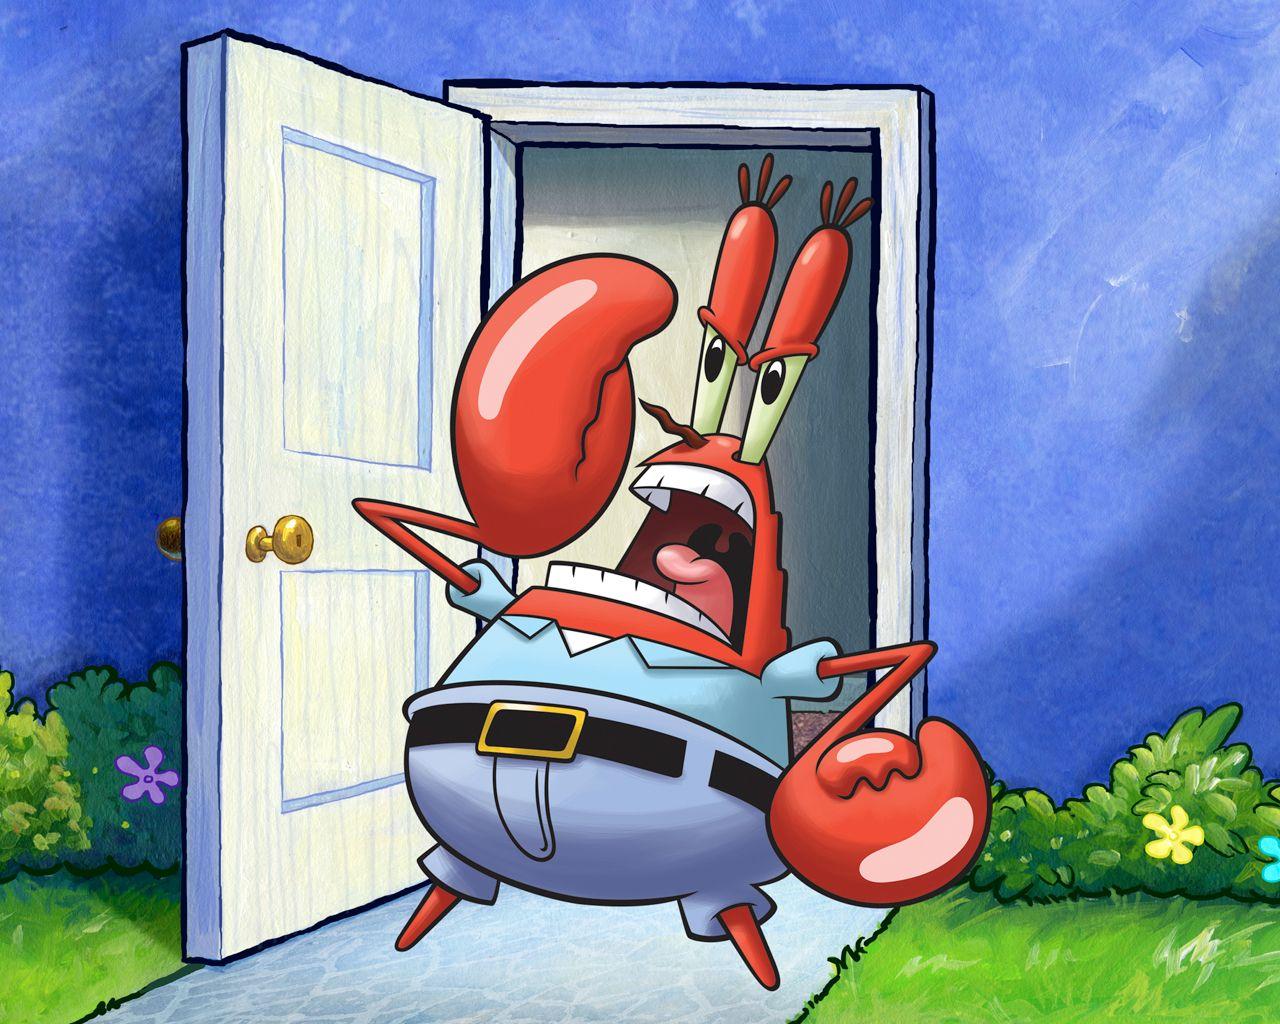 Mr Krabs Spongebob Mr Krabs Spongebob Squarepants